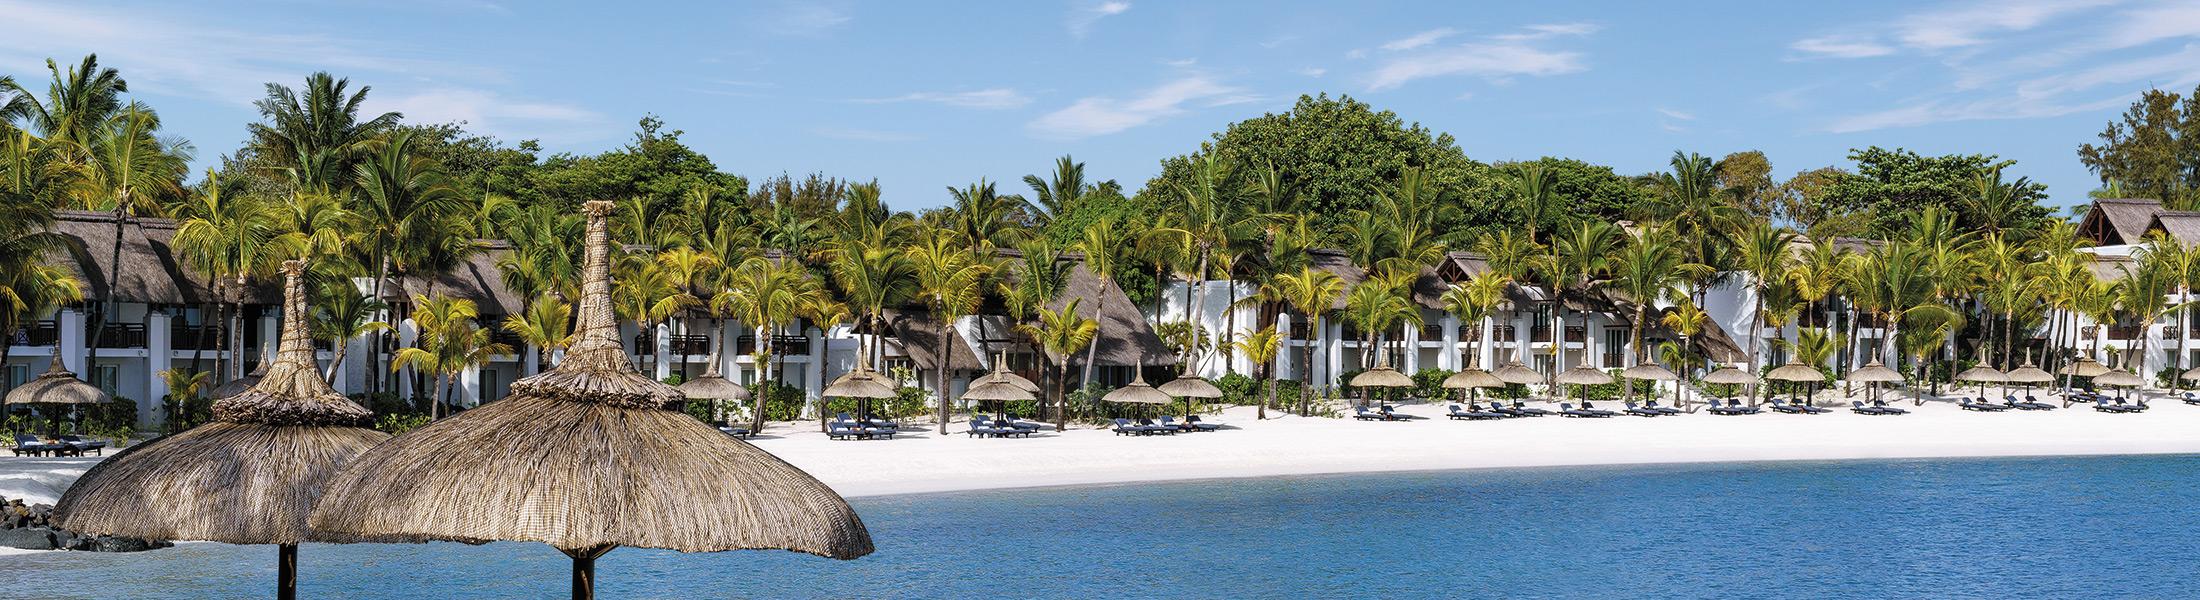 White sand beach at Shangri-La's Le Touessrok Mauritius